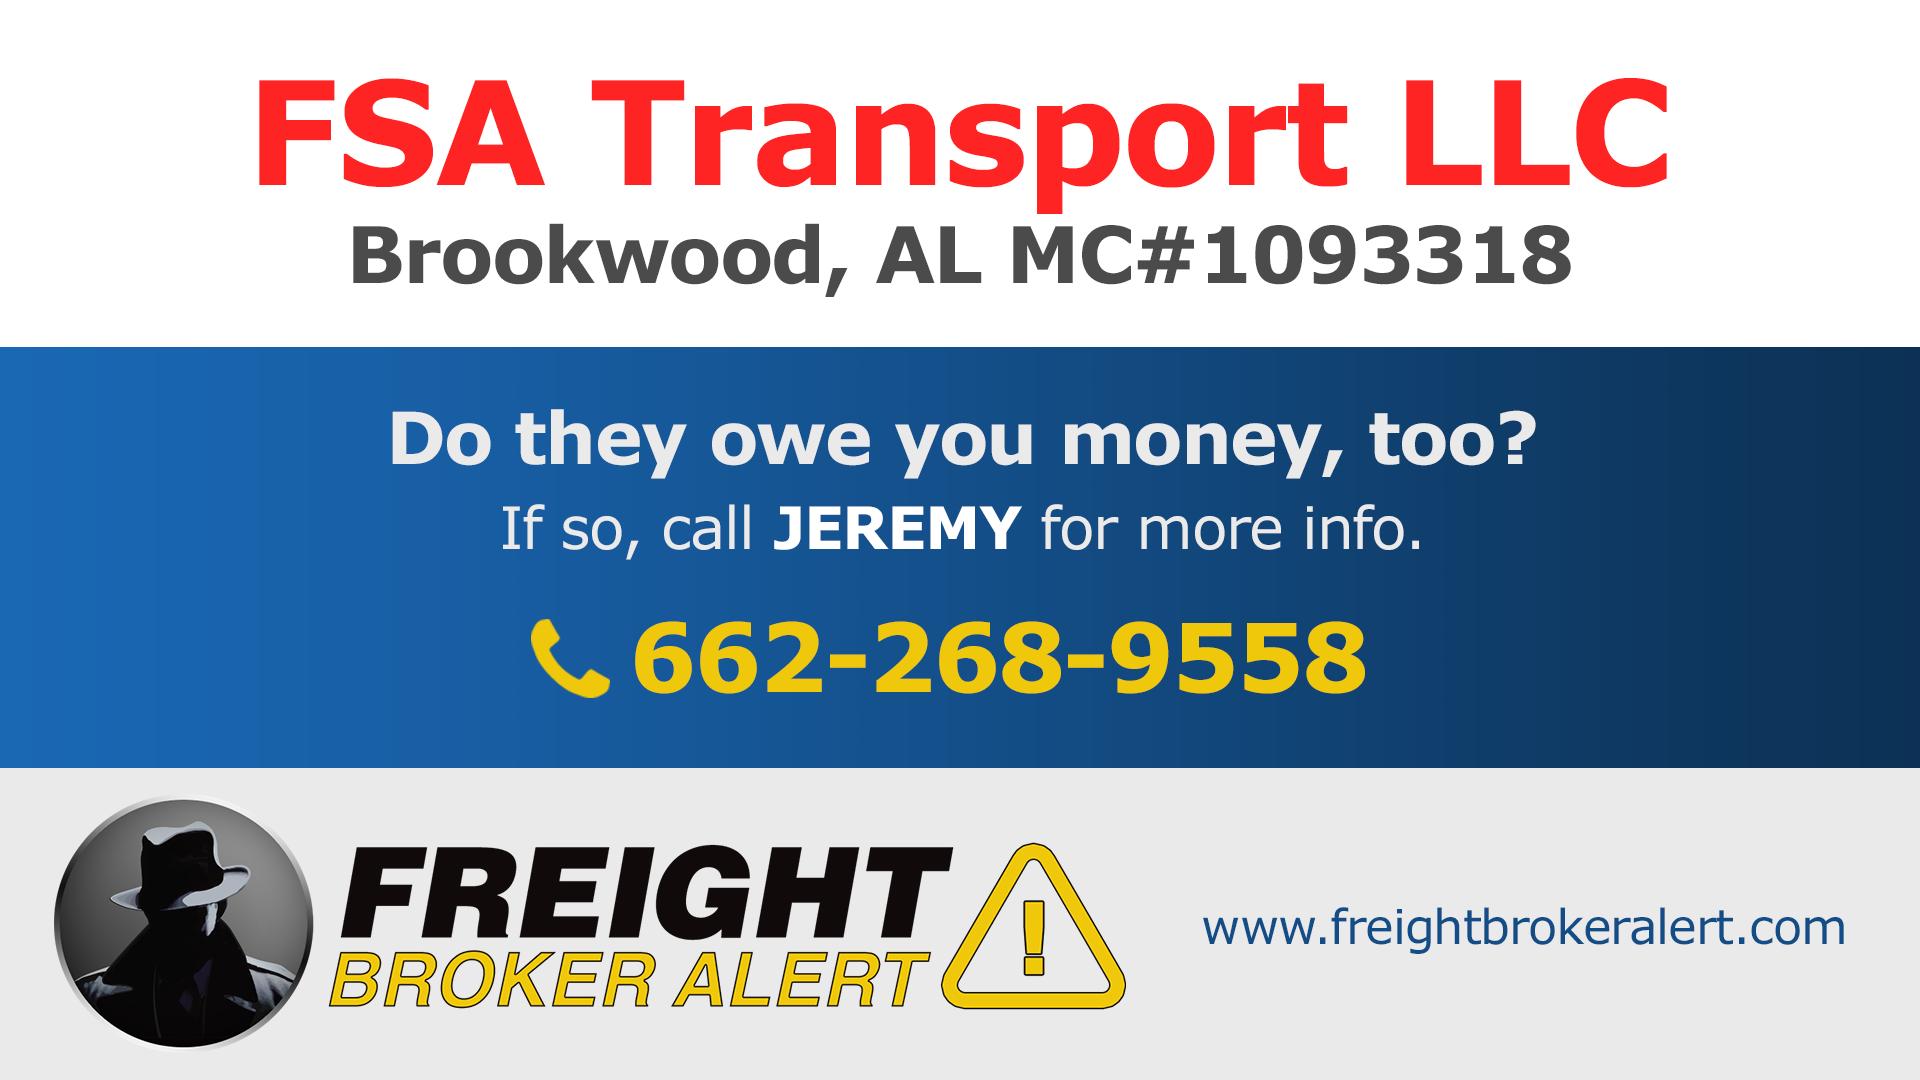 FSA Transport LLC Alabama